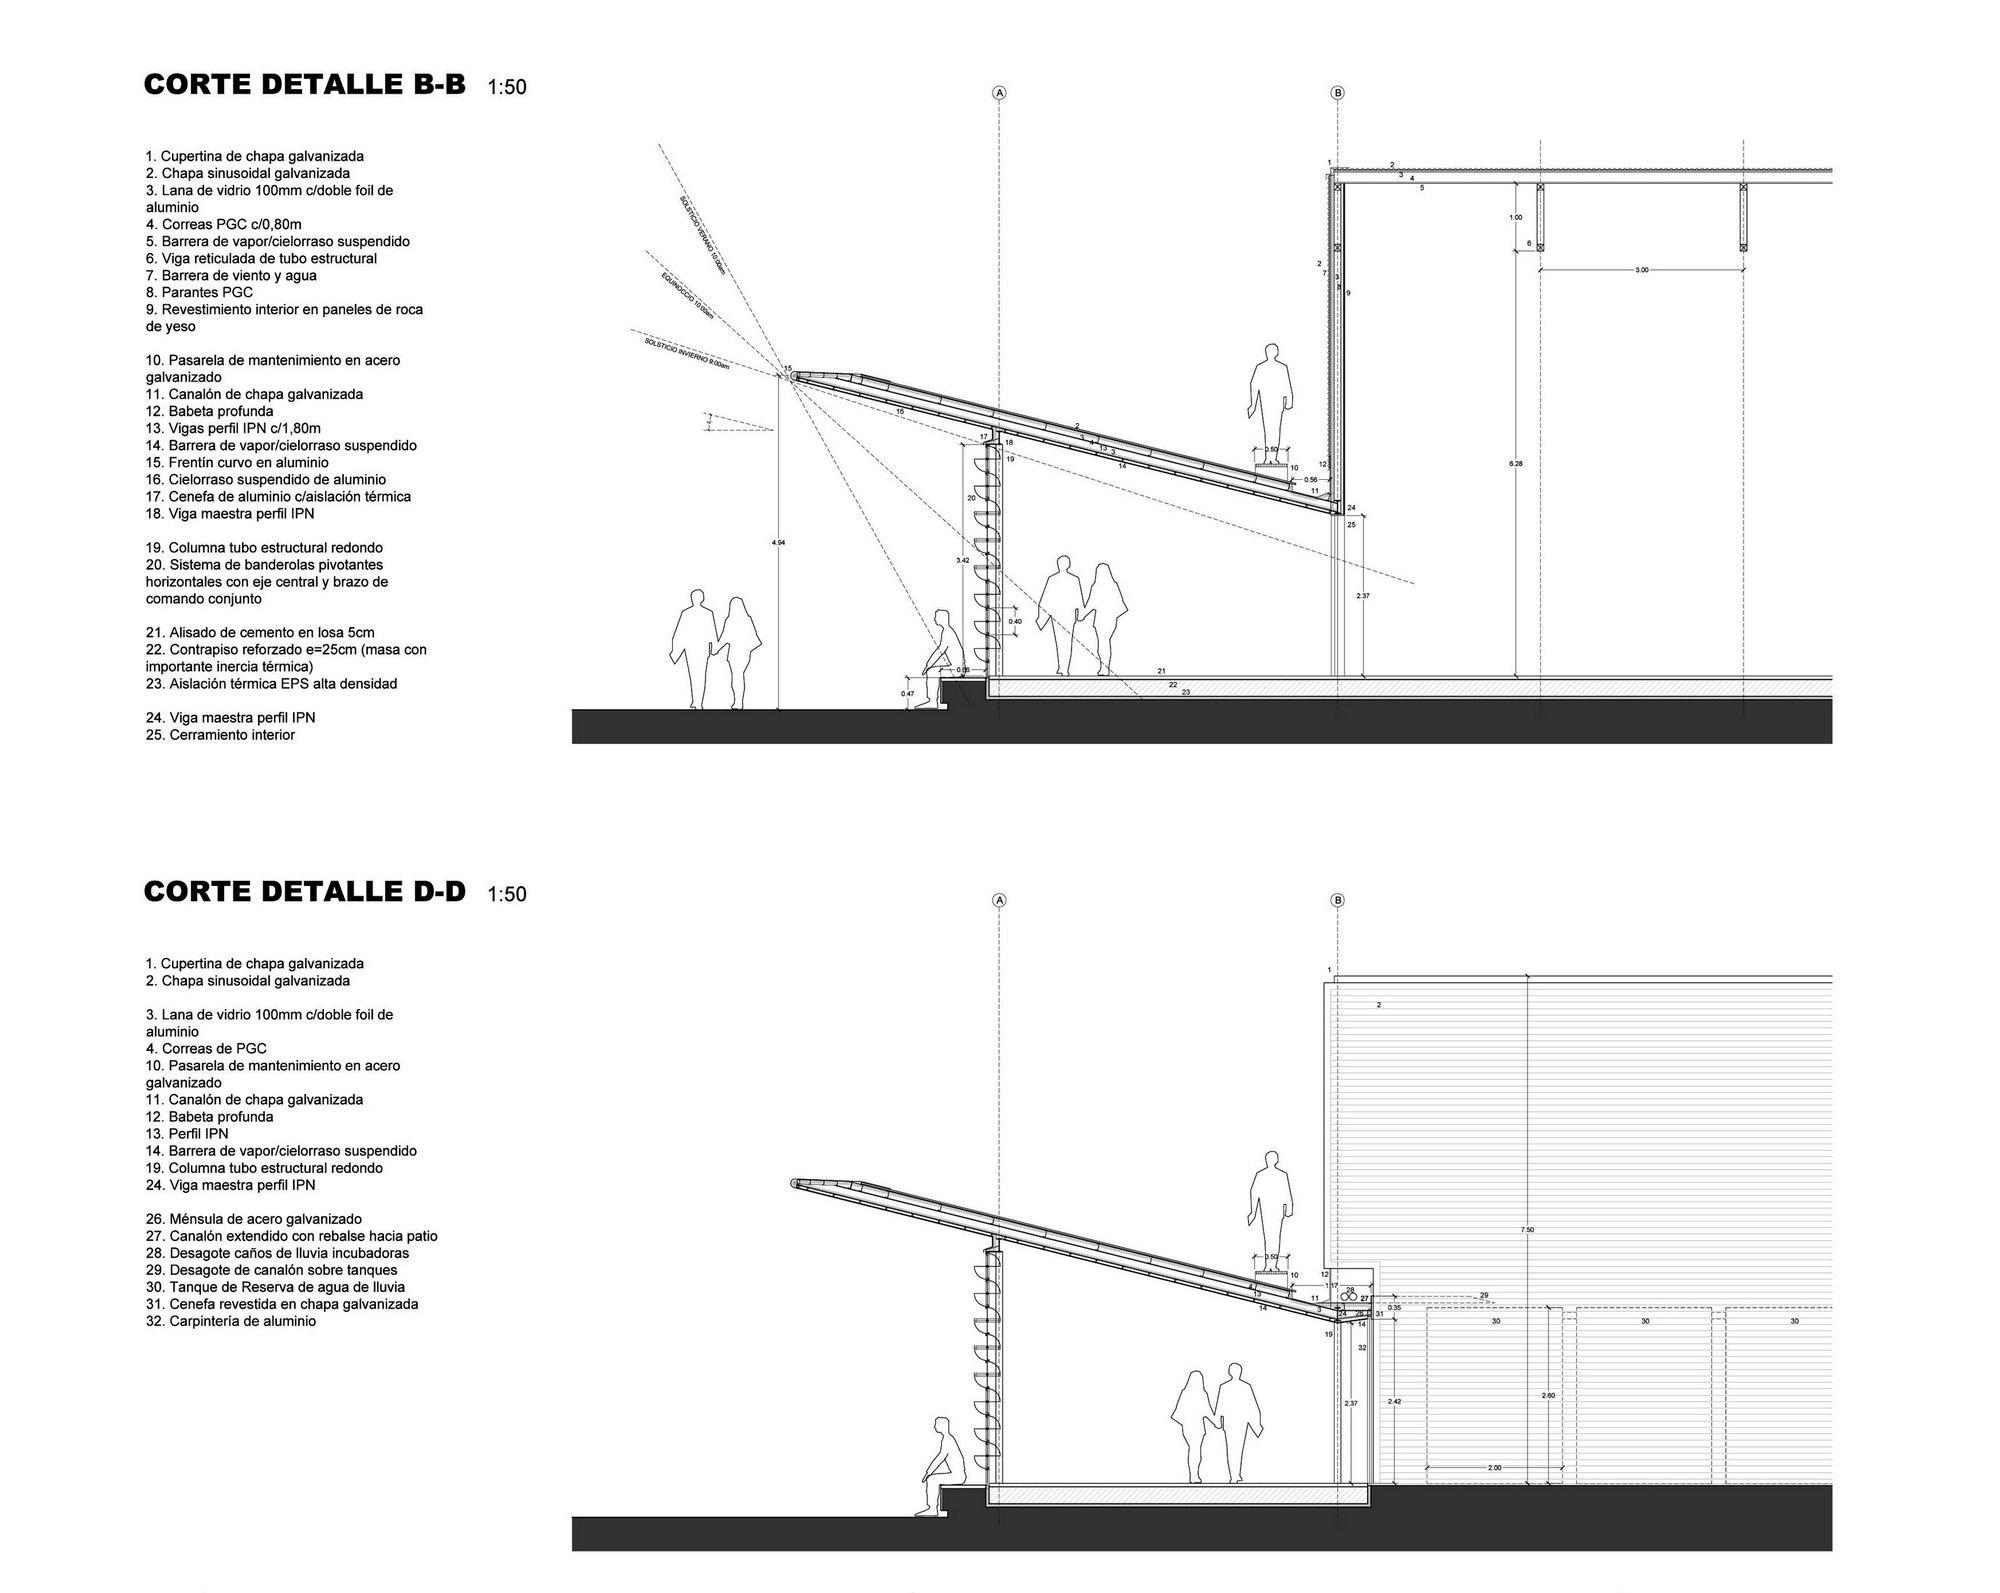 PTLM - 09 detalle constructivo